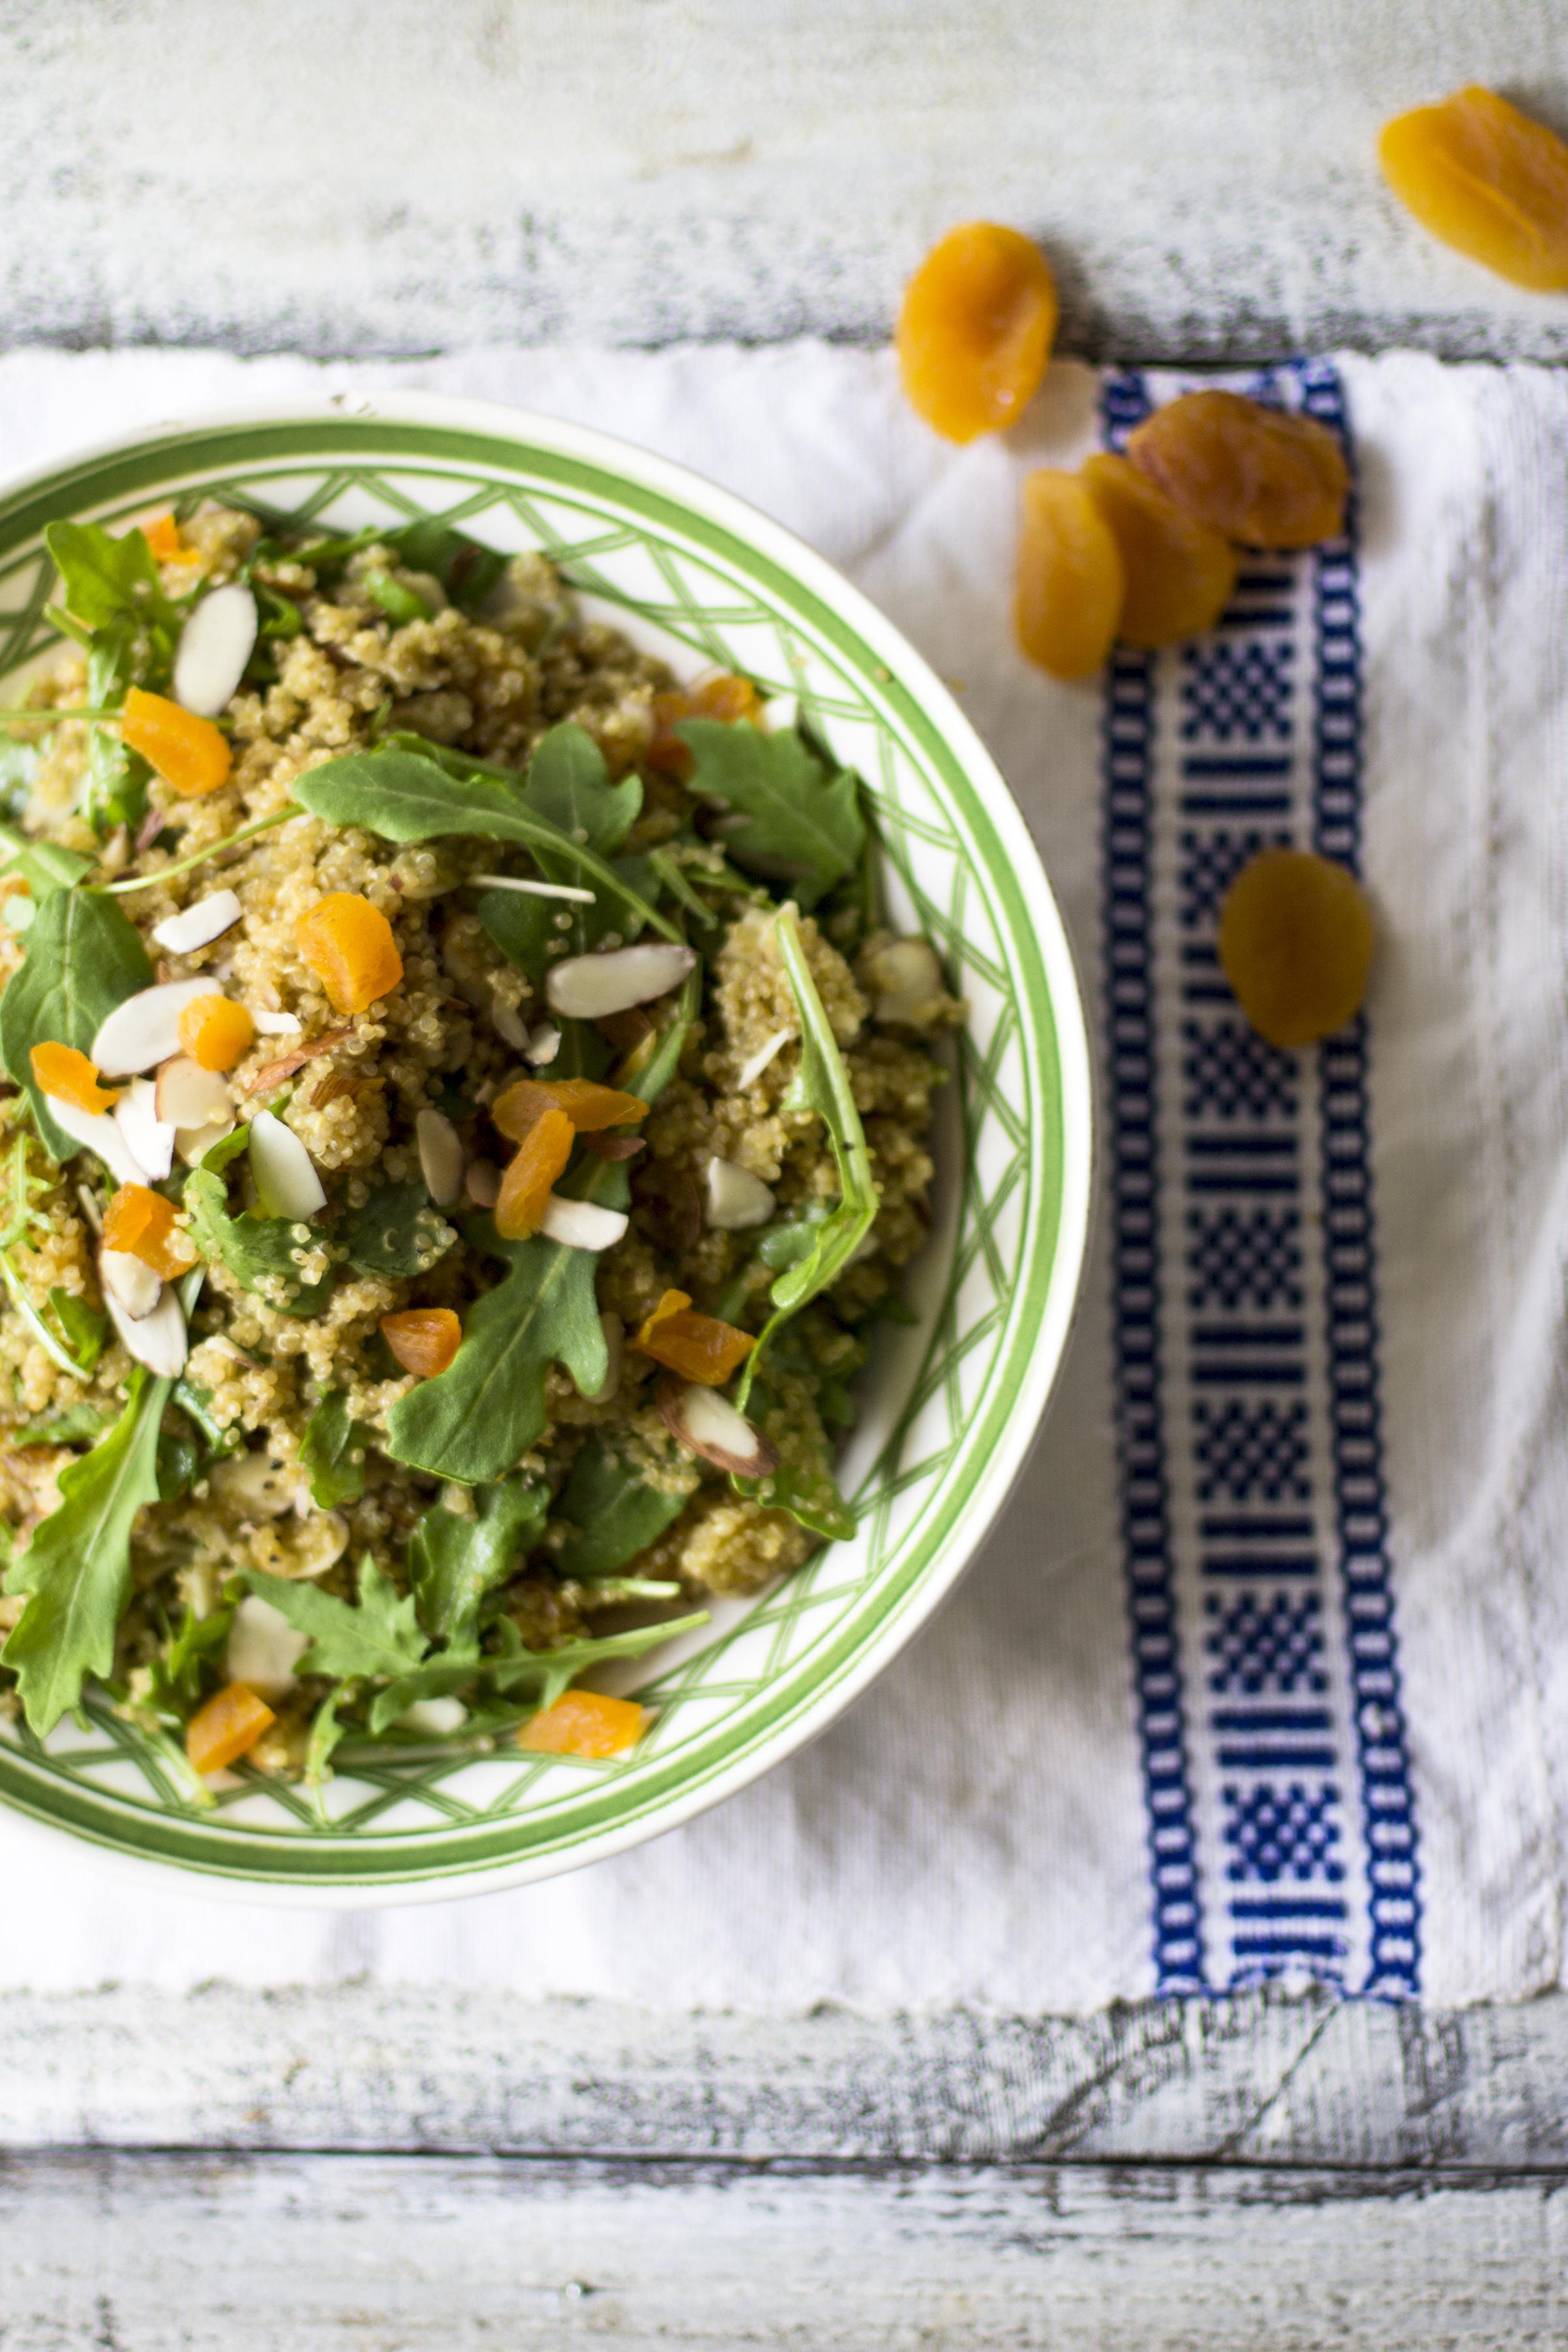 Apricot, Arugula, and Quinoa Salad with a Cumin Vinaigrette: My Diary of Us